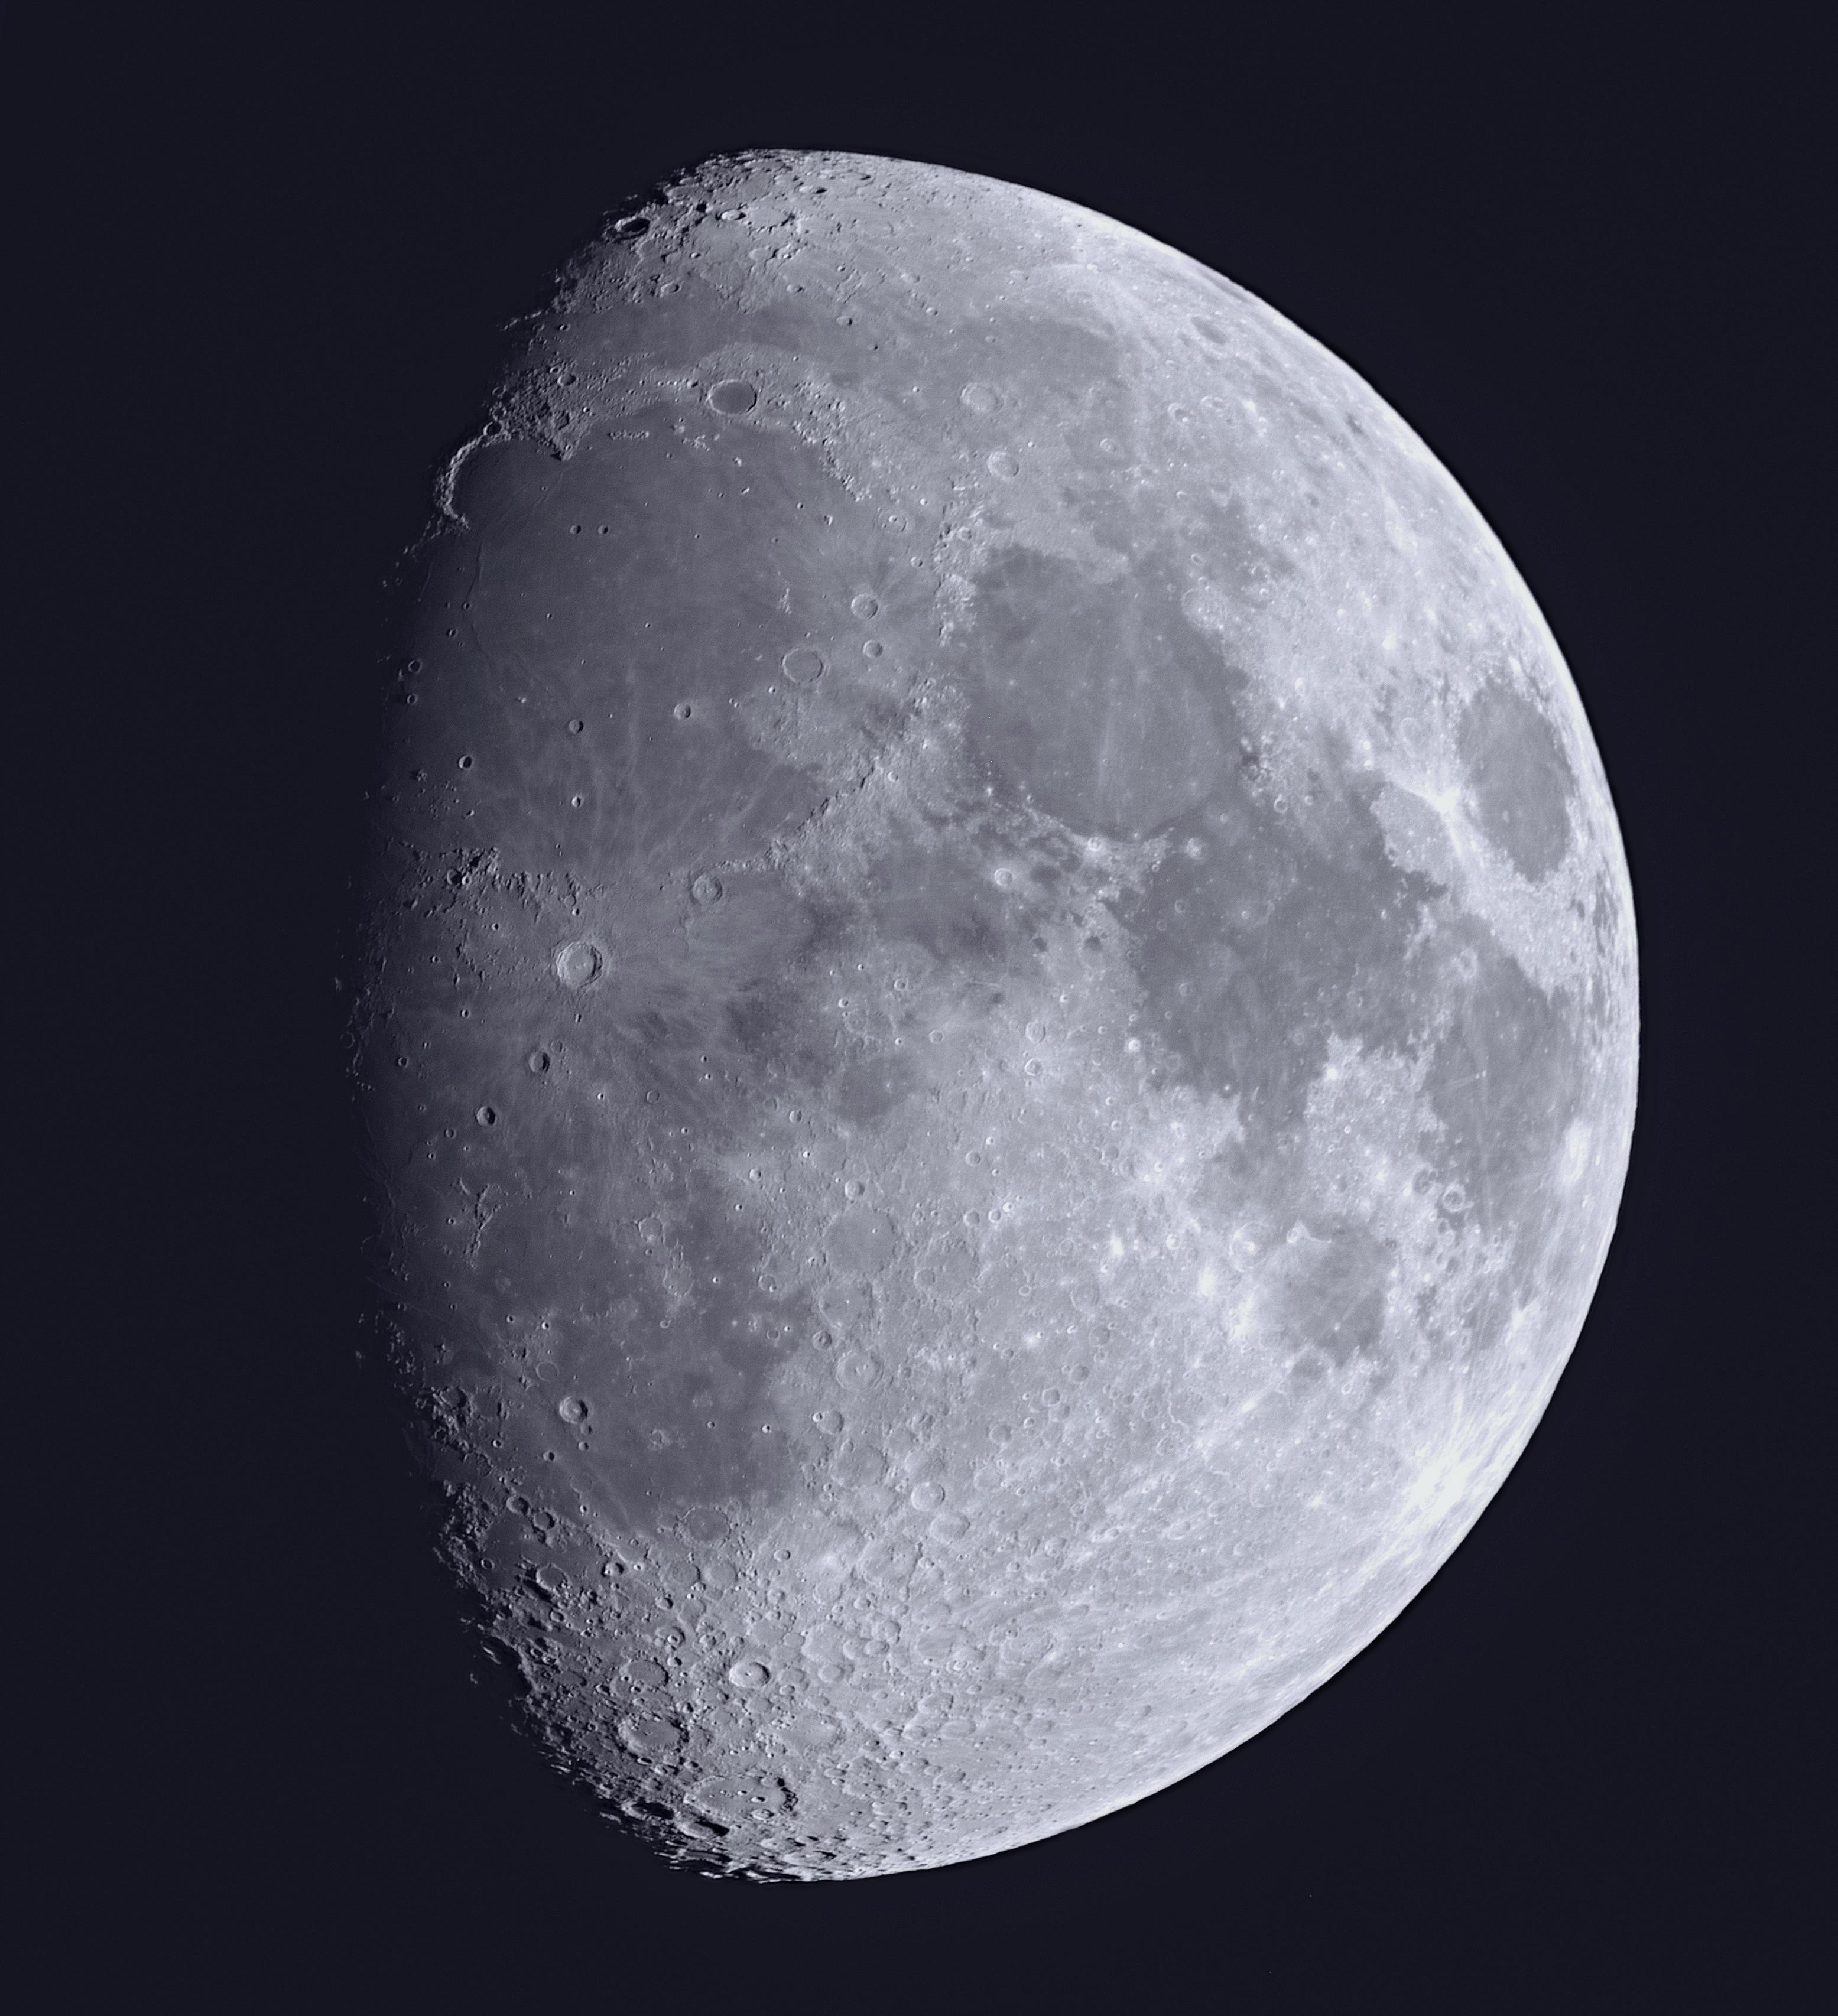 Lune28122017 Tamron 150-600 x2 V2